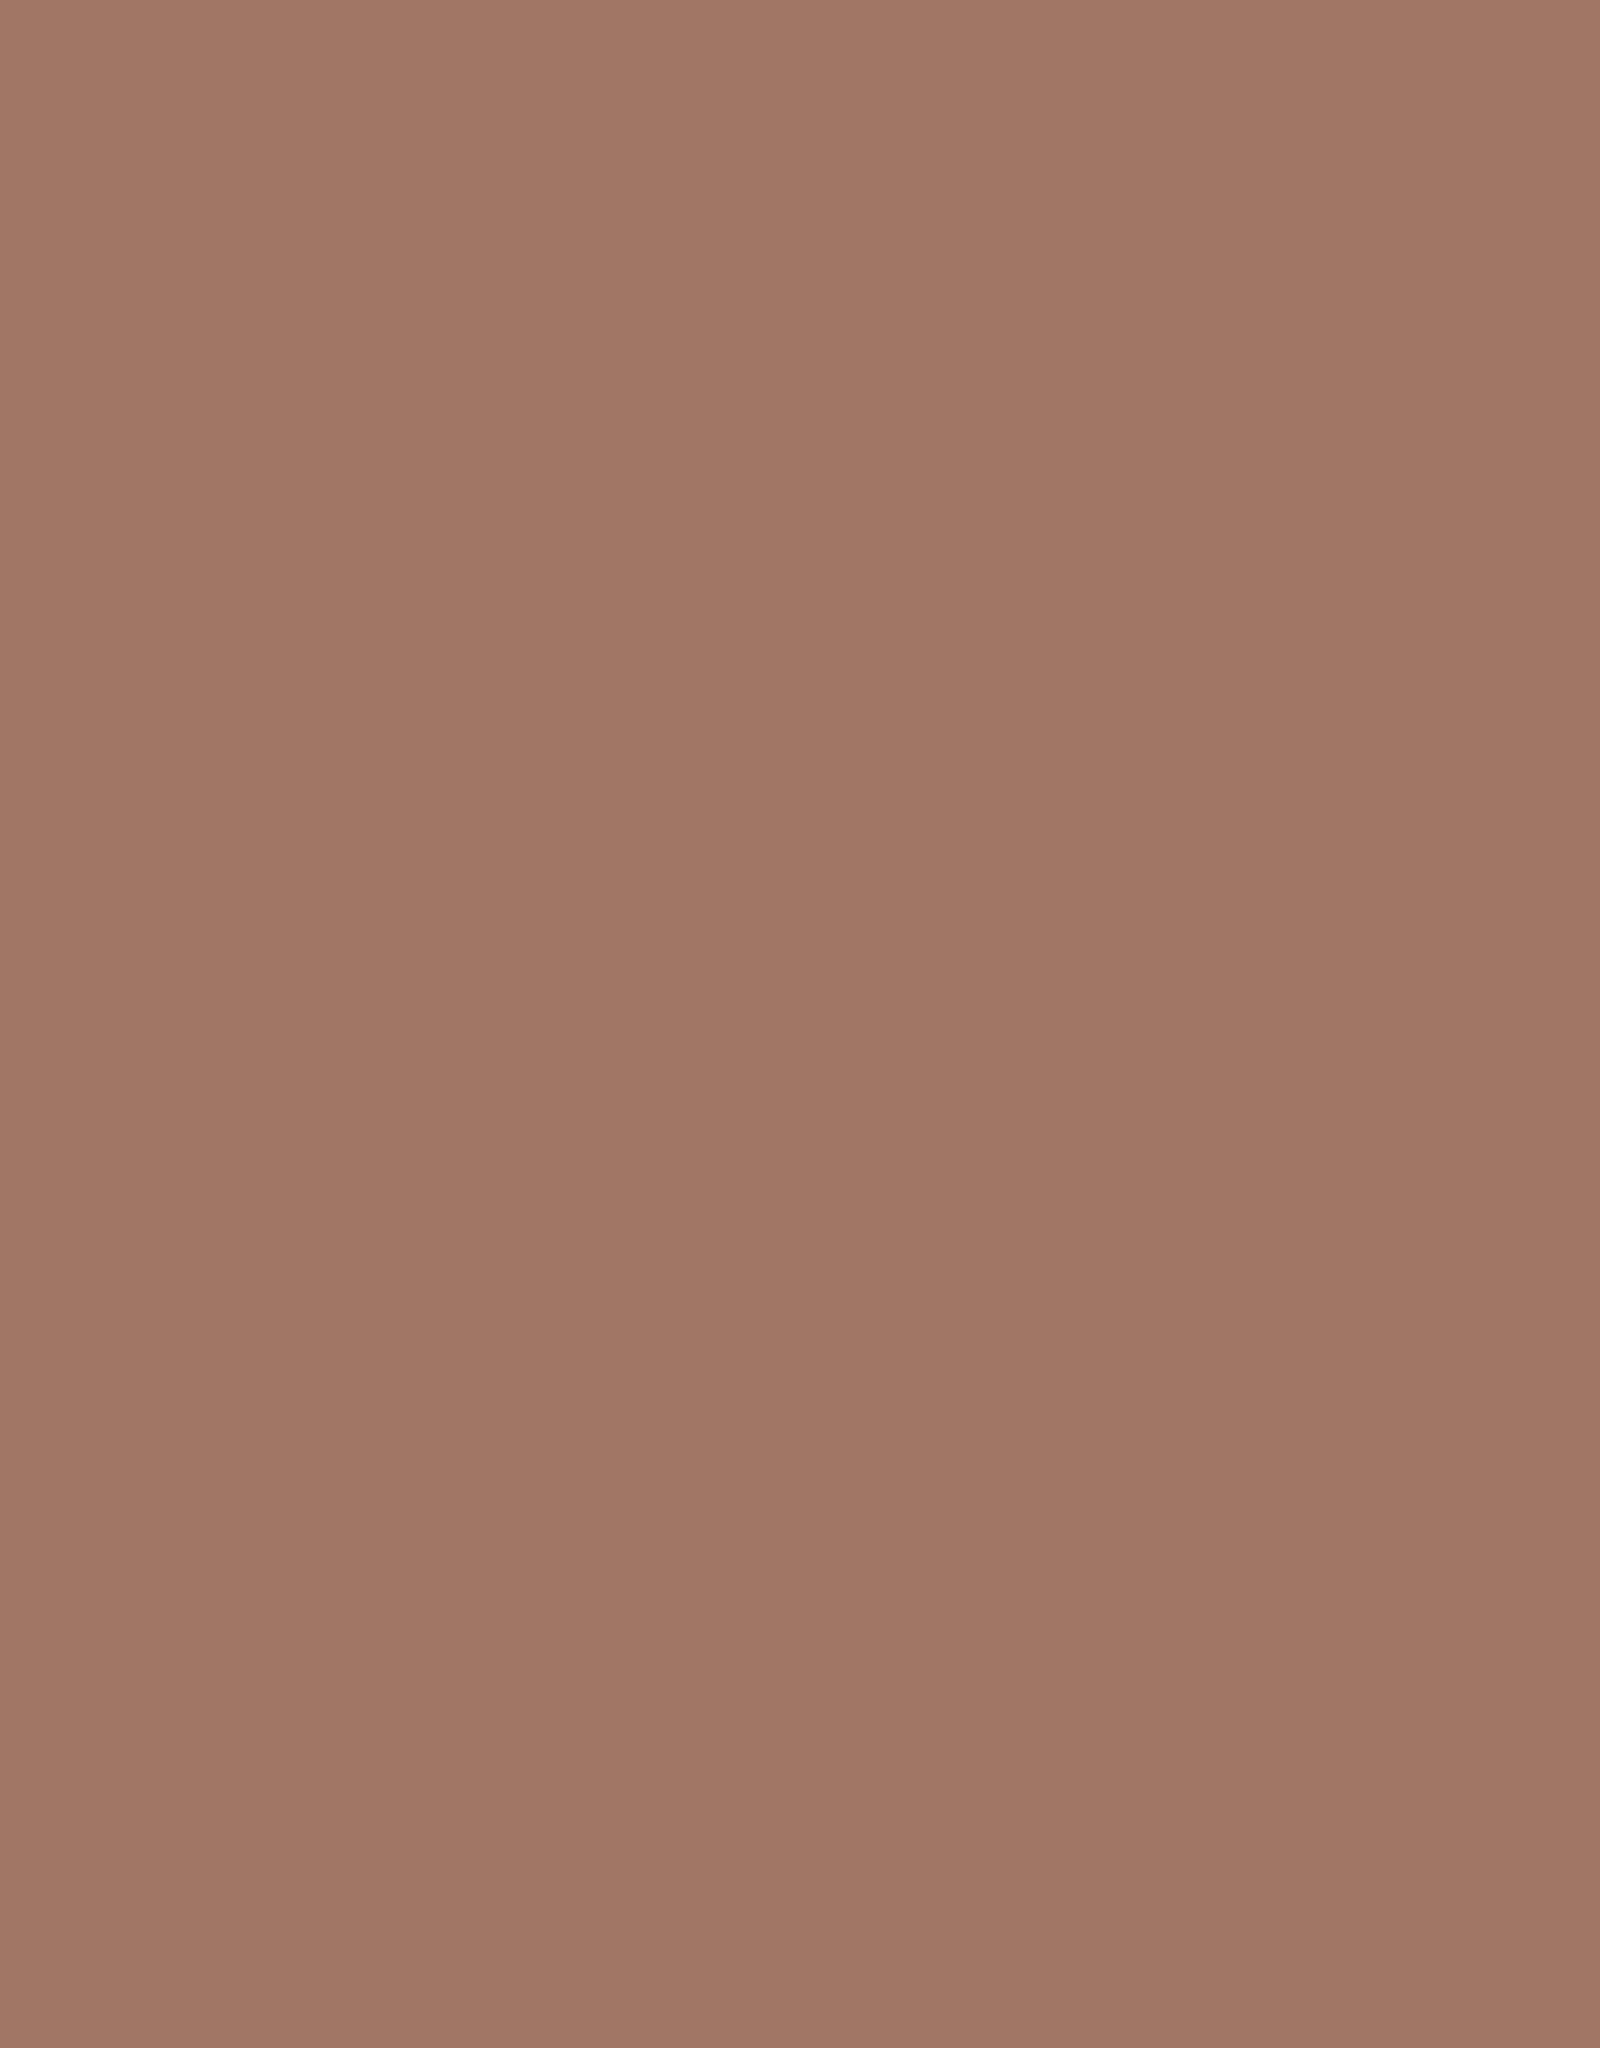 Sennelier, Extra Fine Soft Pastel, Van Dyck Brown